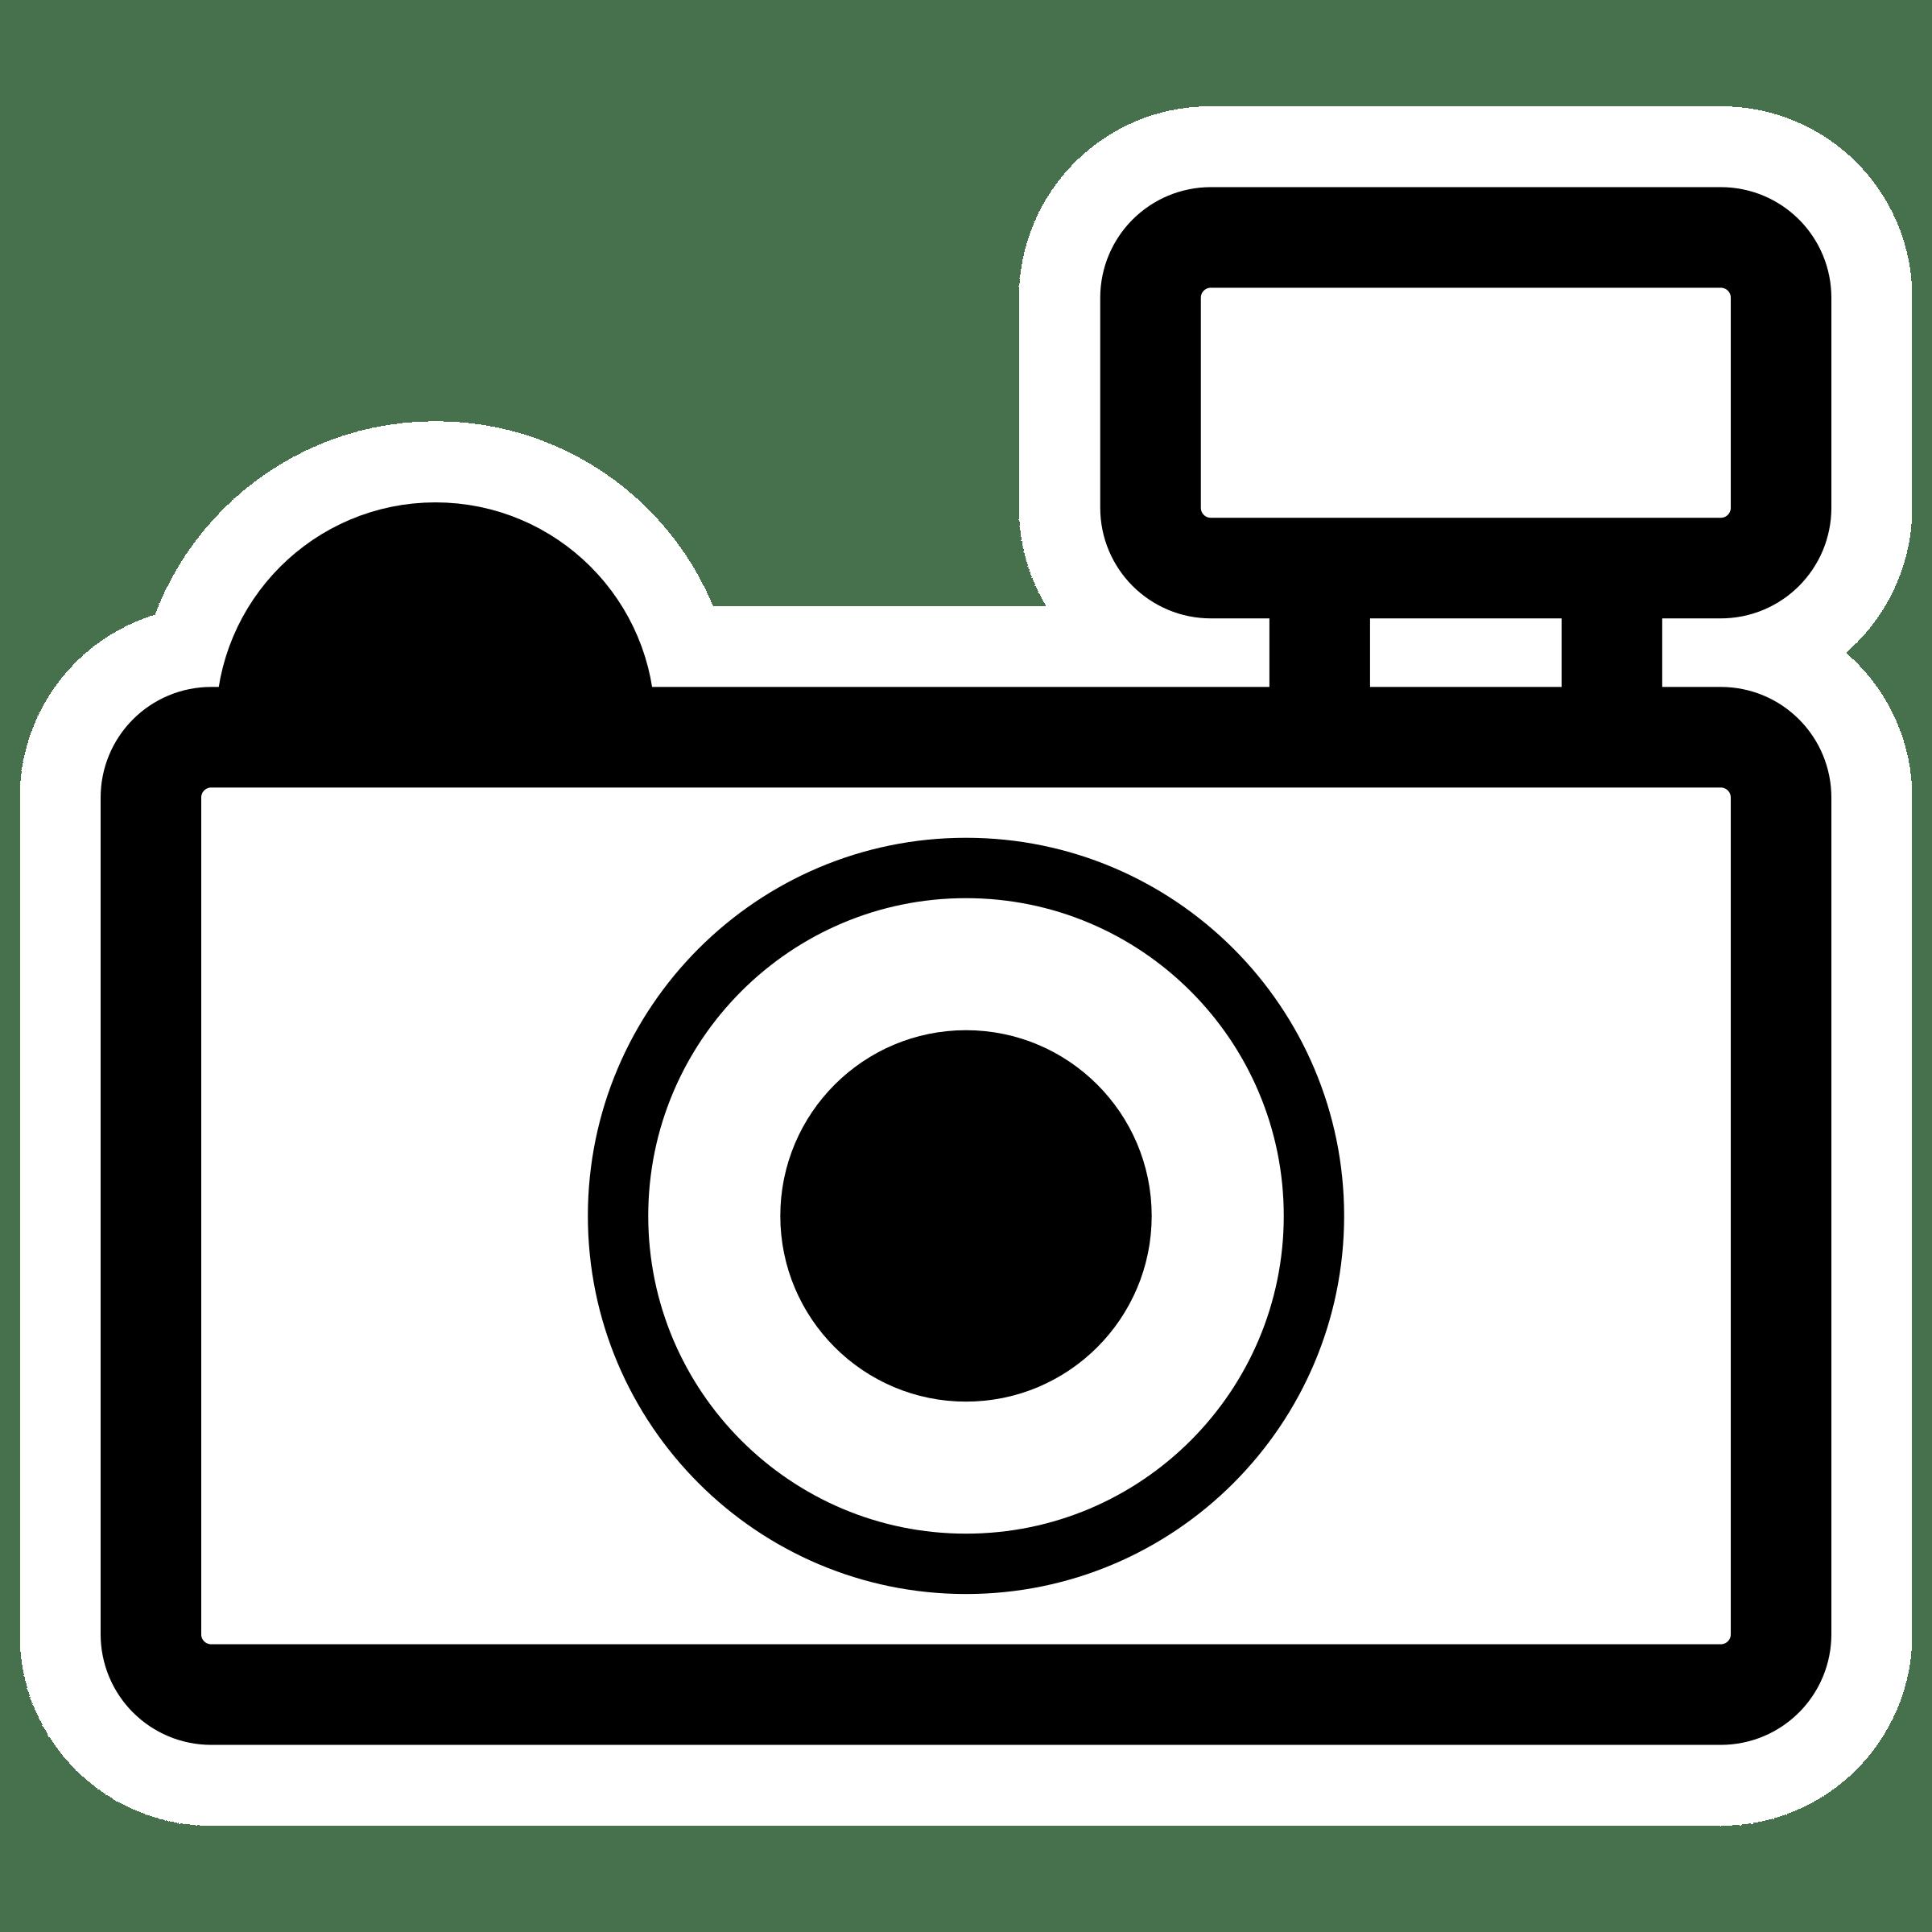 Clipart fotokamera clip freeuse library Clipart kamera 2 » Clipart Portal clip freeuse library